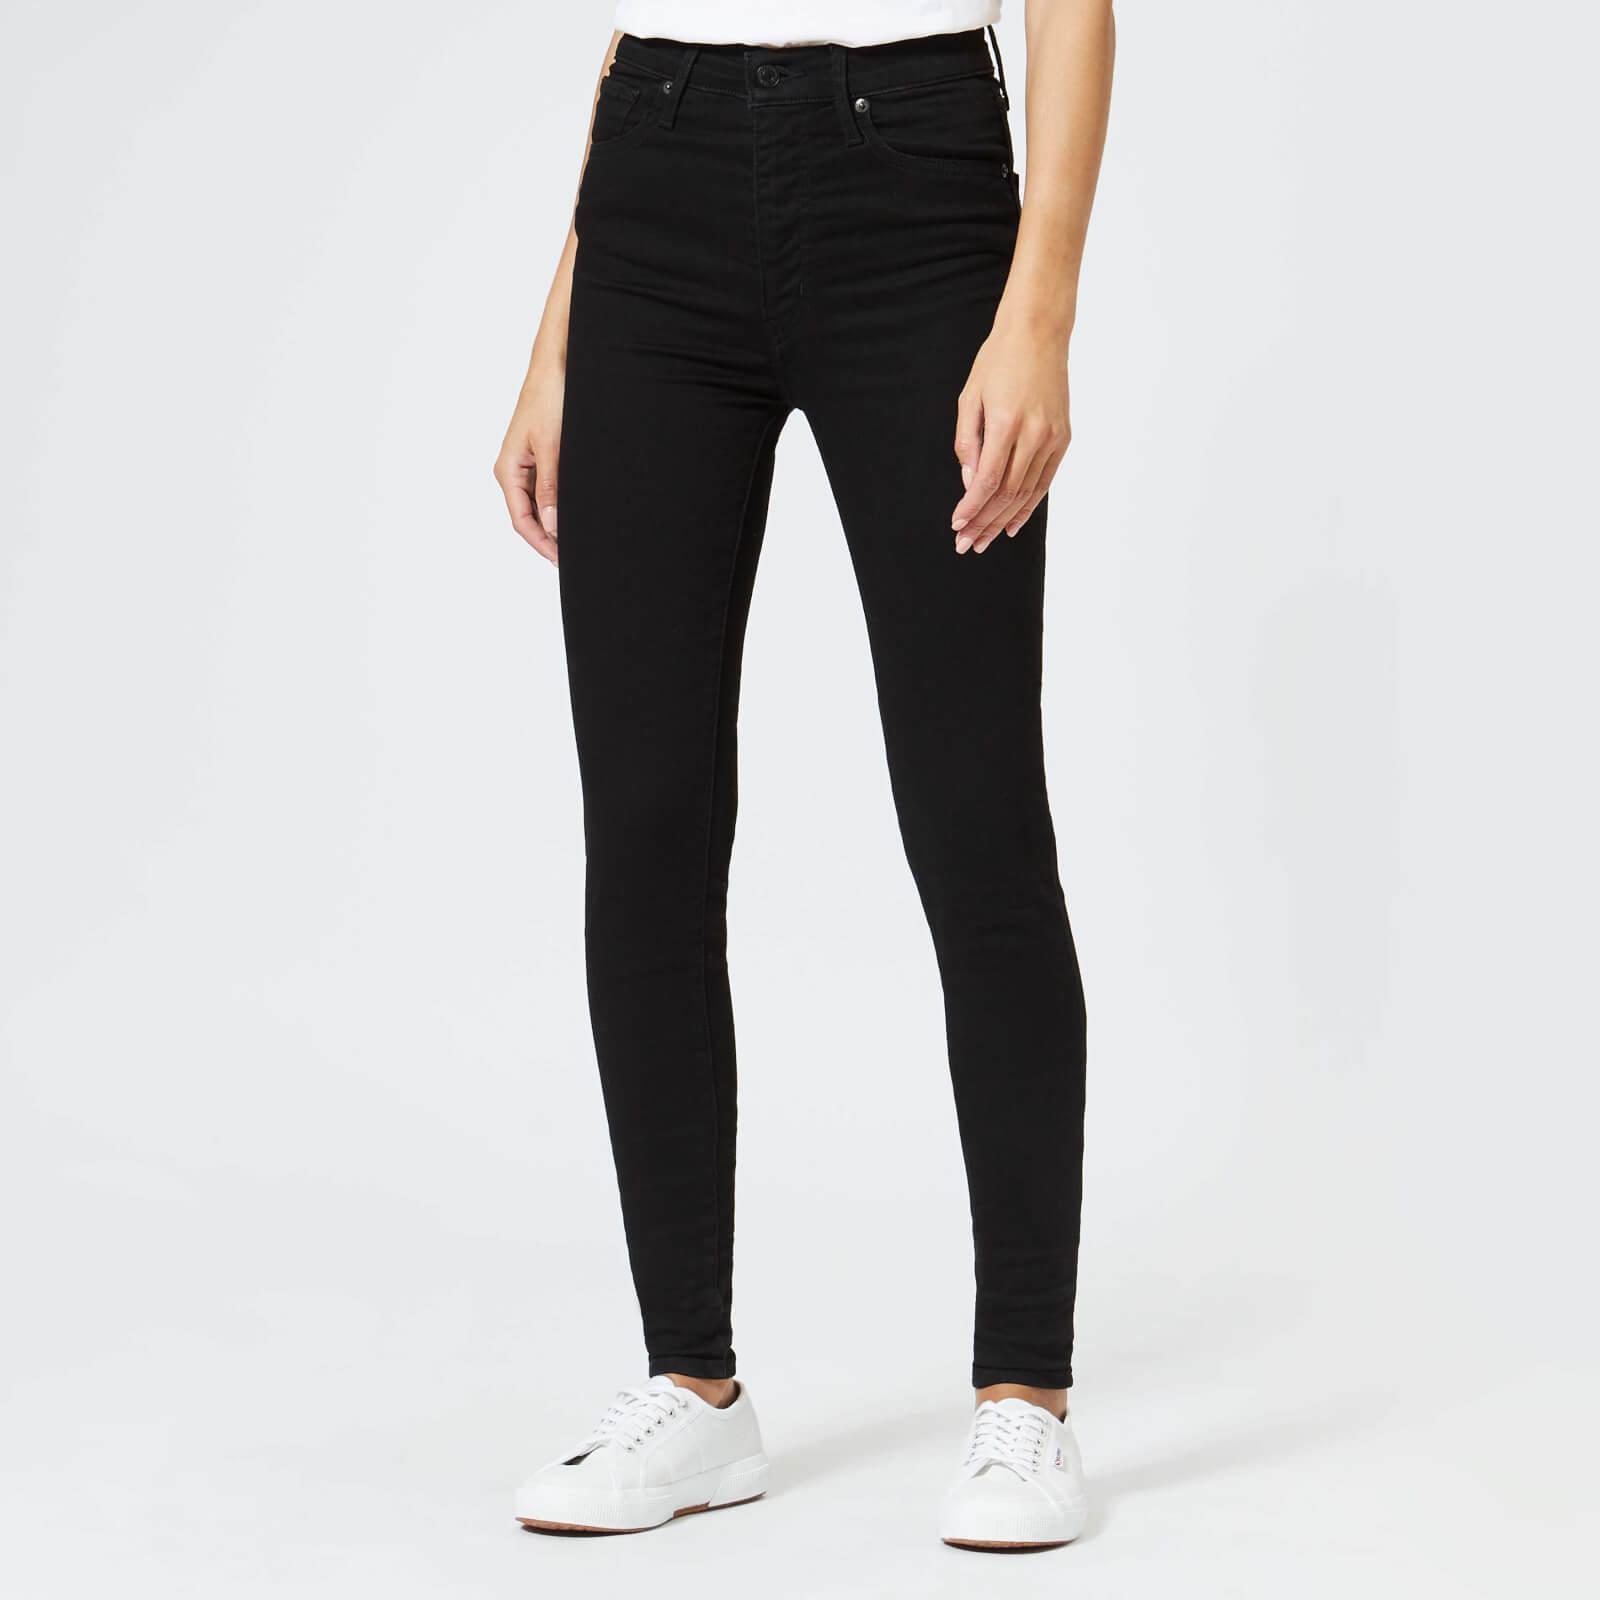 Levi's s Mile High Super Skinny Jeans - Black Galaxy - W26/L32